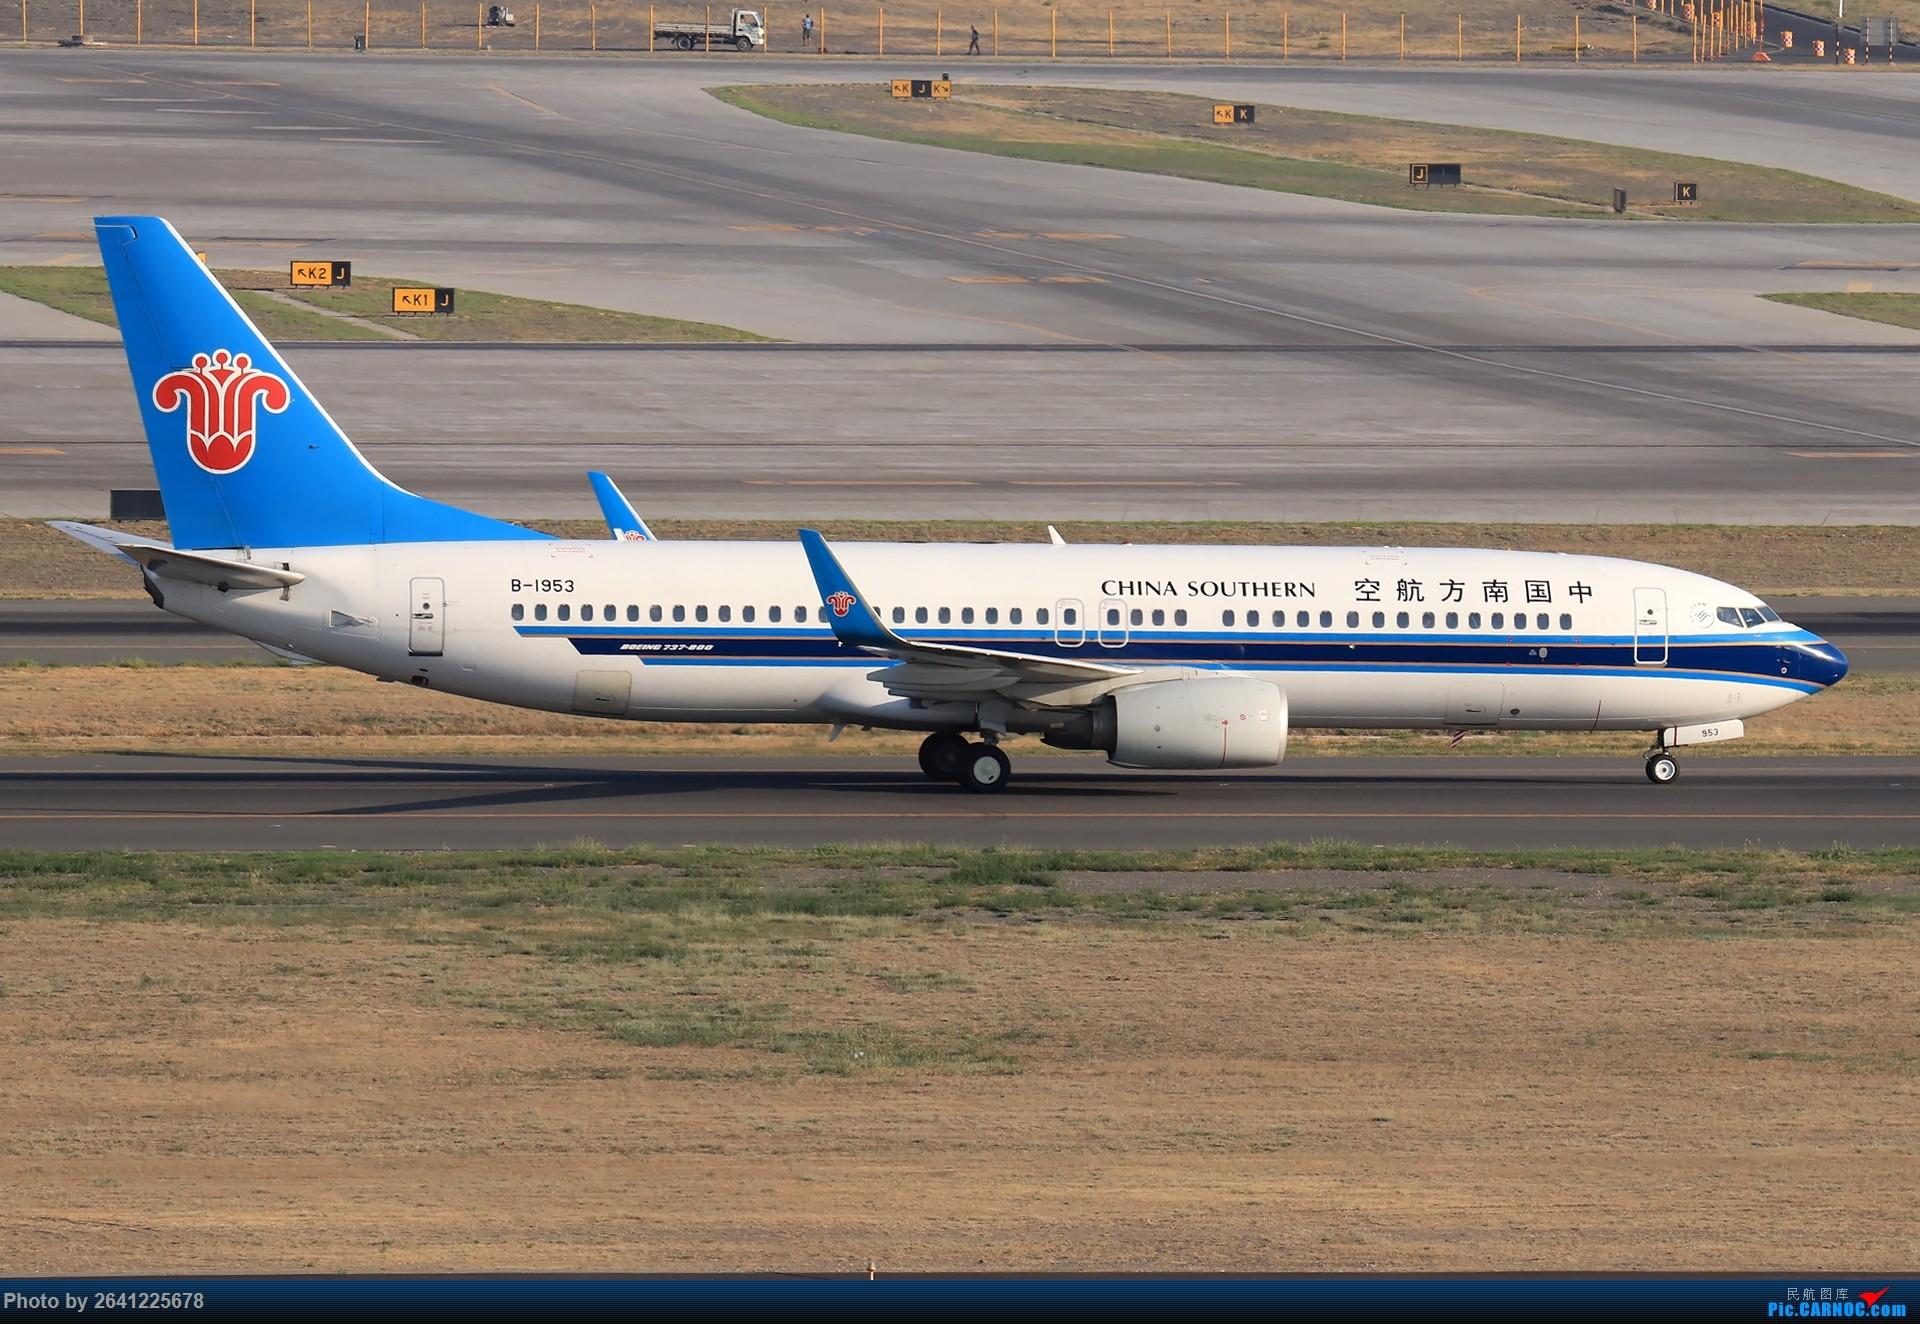 Re:[原创]【小周游记第7集拍机贴】乌鲁木齐绝美的地景和光线 BOEING 737-800 B-1953 中国乌鲁木齐地窝堡国际机场